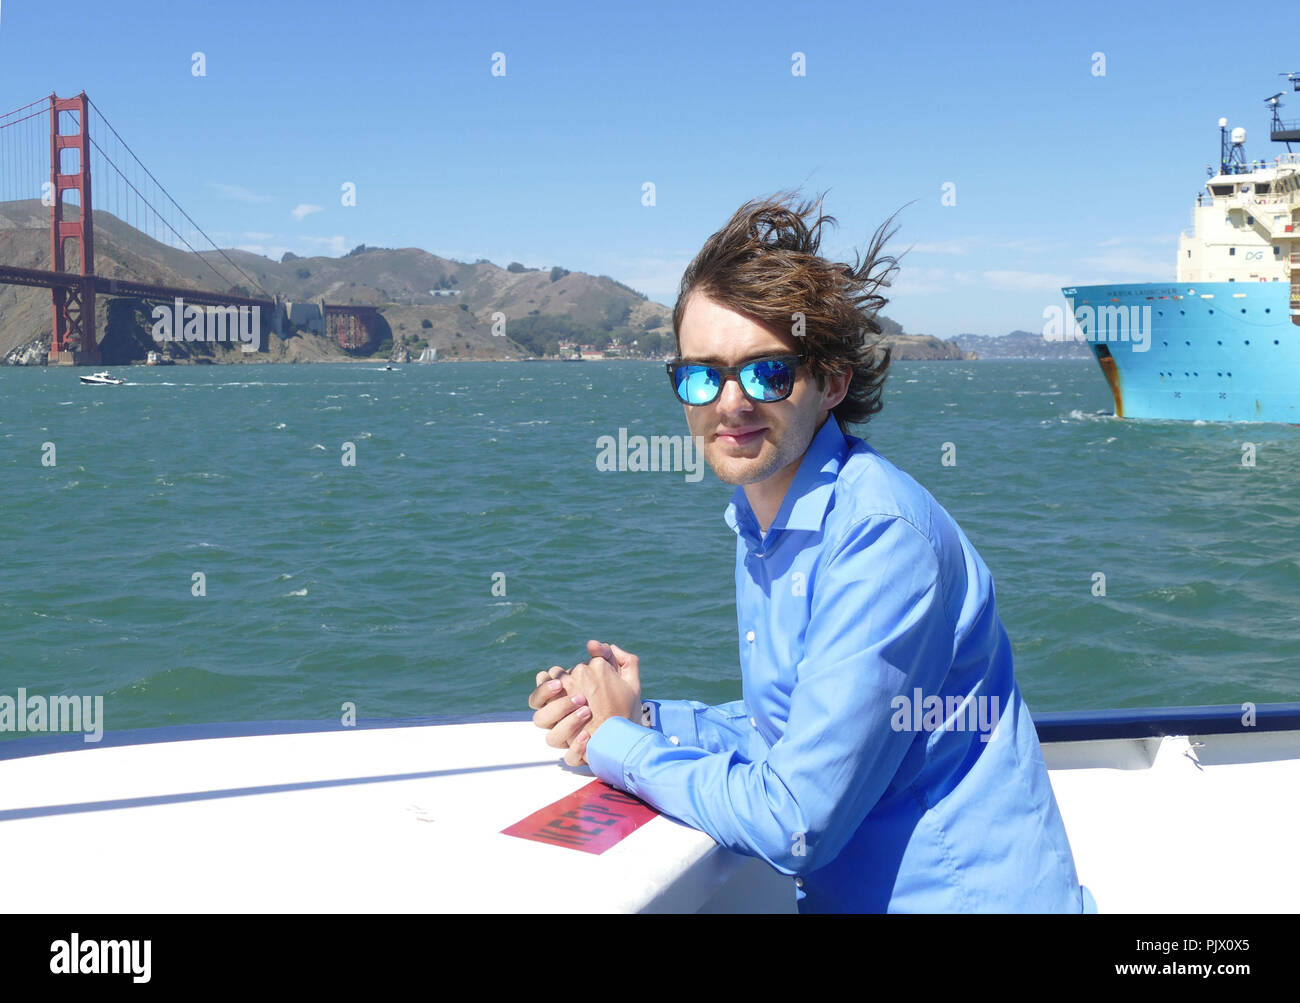 Boyan Slat Stock Photos & Boyan Slat Stock Images - Alamy